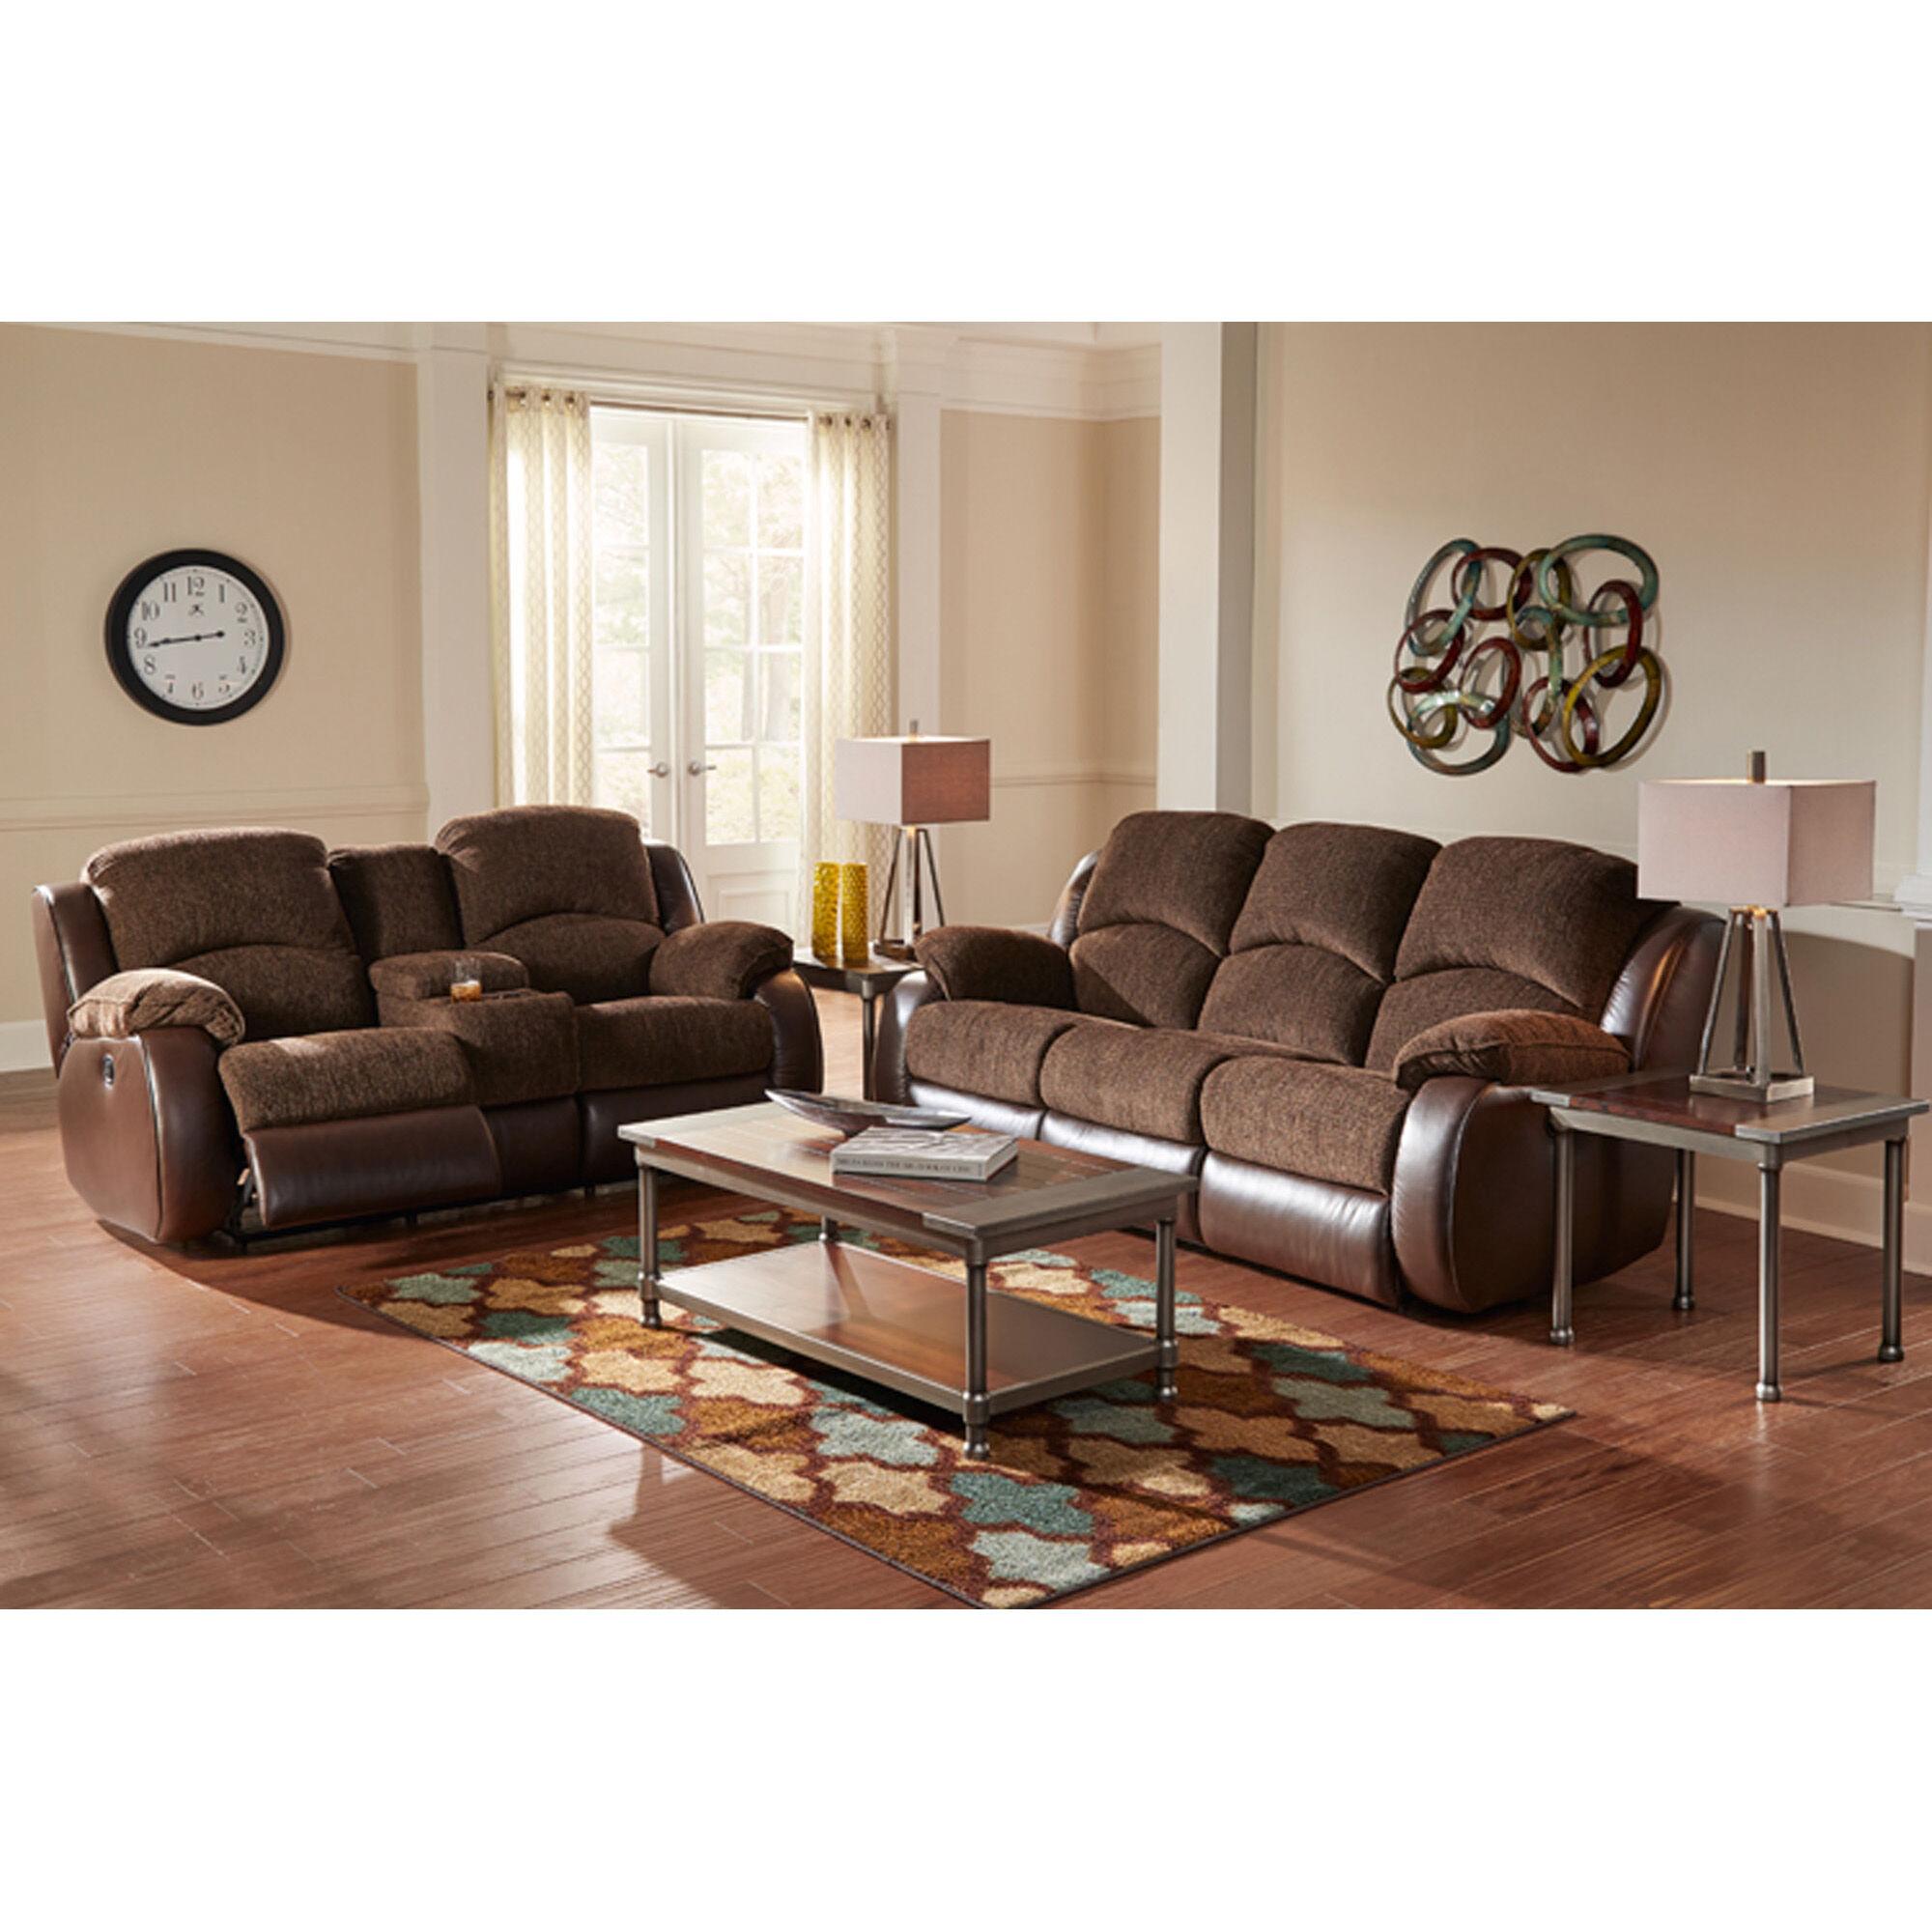 Woodhaven Industries Living Room Sets 7Piece Memphis